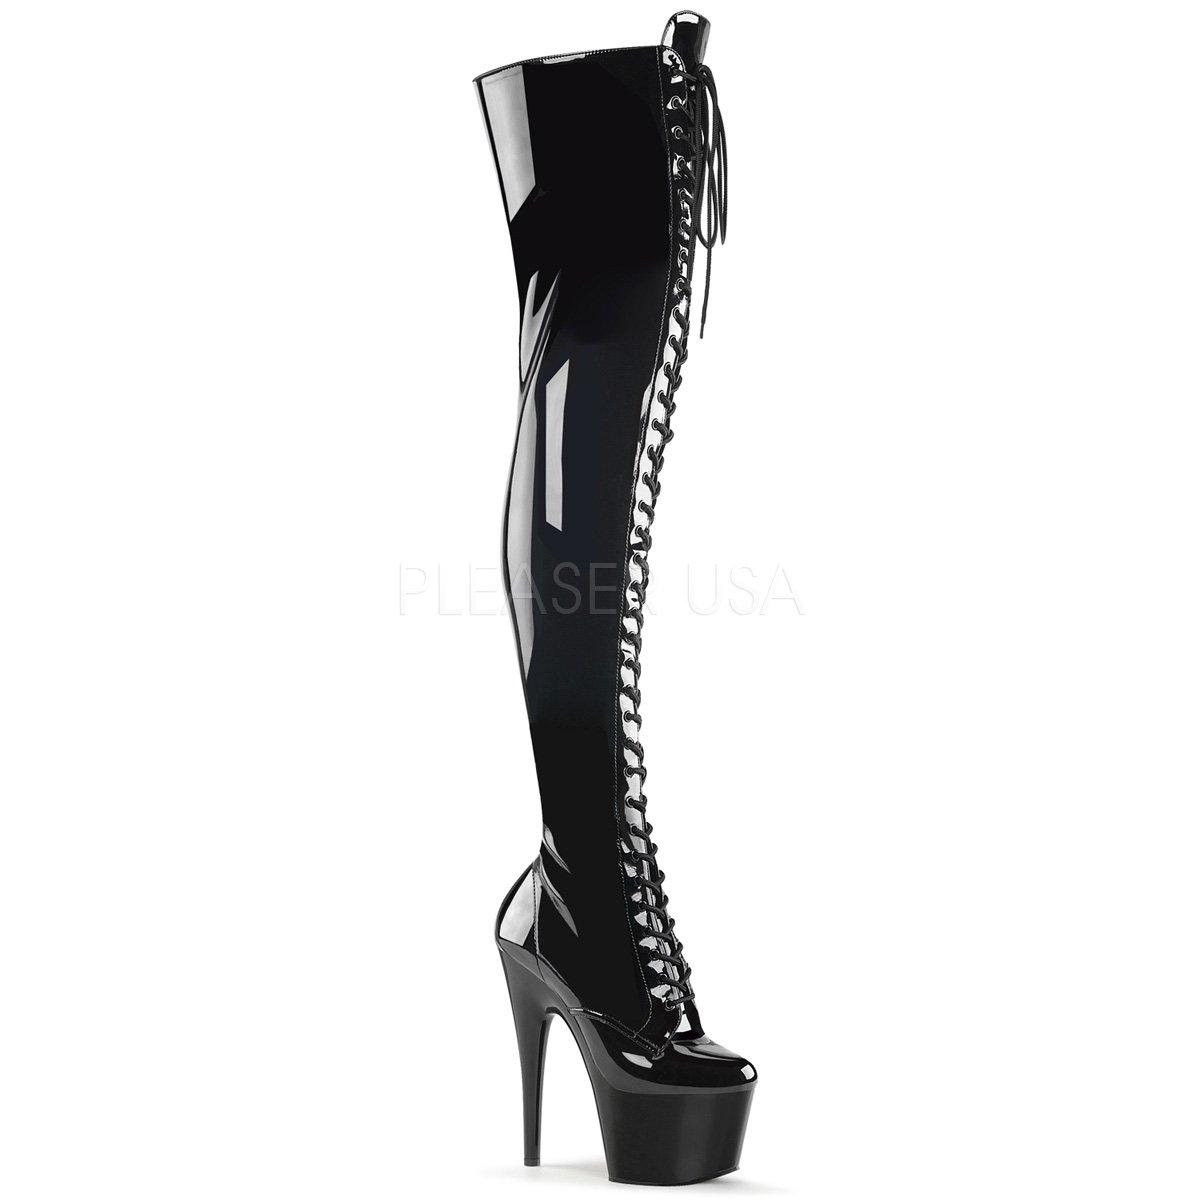 Pleaser ADORE-3023 Women Platform Front Lace-Up Stretch Platform Thigh High Boot B01MQTEKP1 12 B(M) US|Black Str Patent/Black